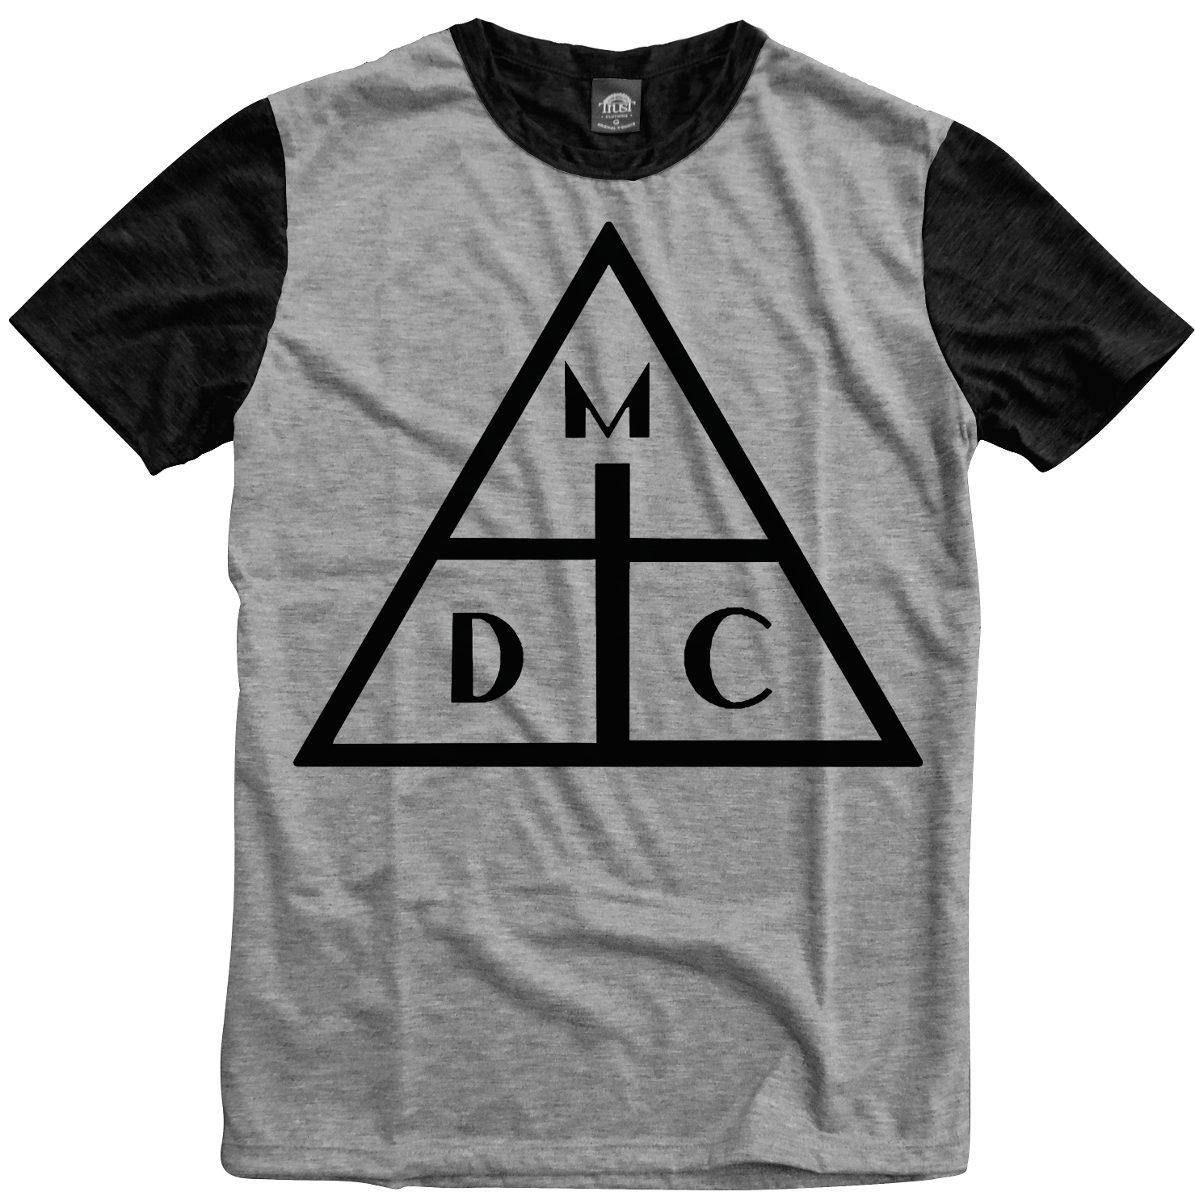 damassaclan dmc kings swag mescla camiseta personalizada. Carregando zoom. 1a959904b60